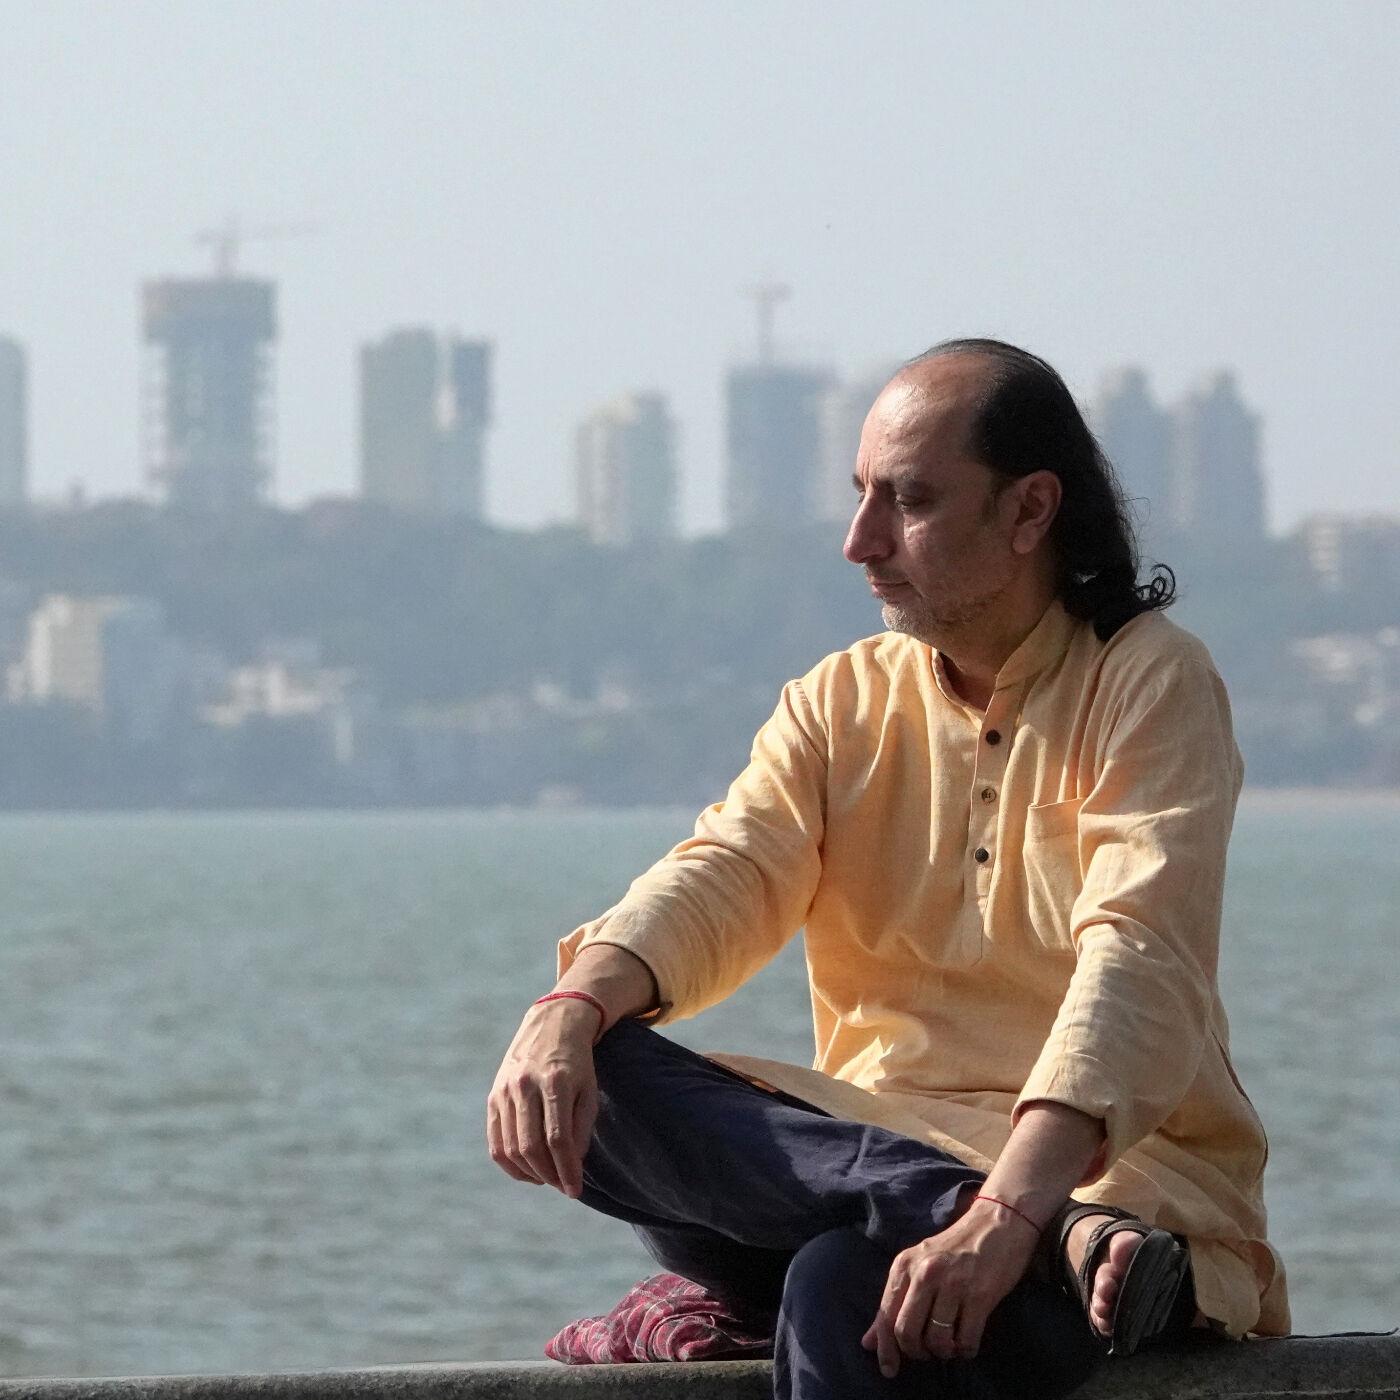 Making Meditation a Way of Life